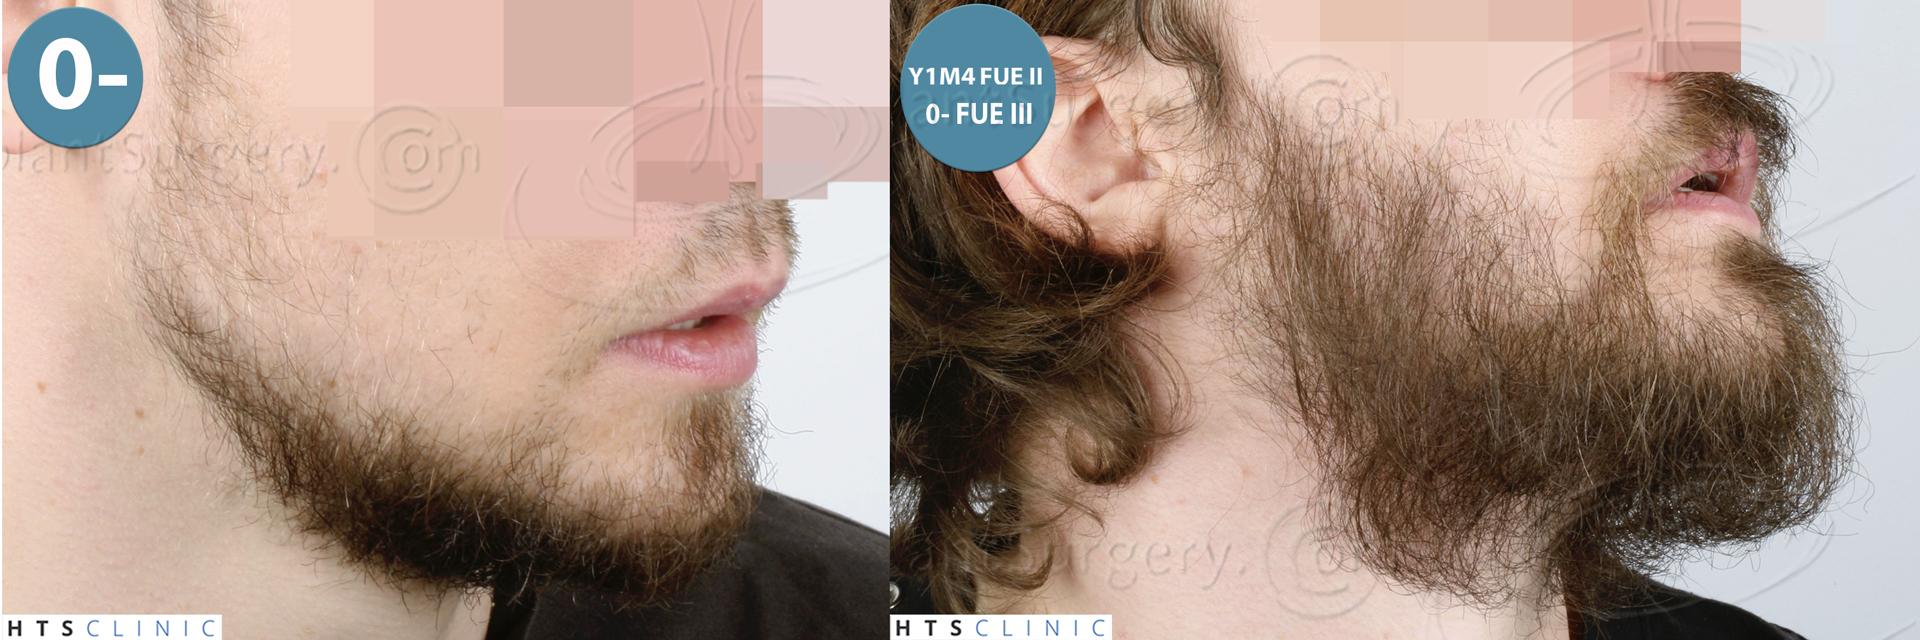 Dr.Devroye-HTS-Clinic-6132-_2011_1232_2889_-FUE-Barbe-et-cheveux-Montage3.jpg